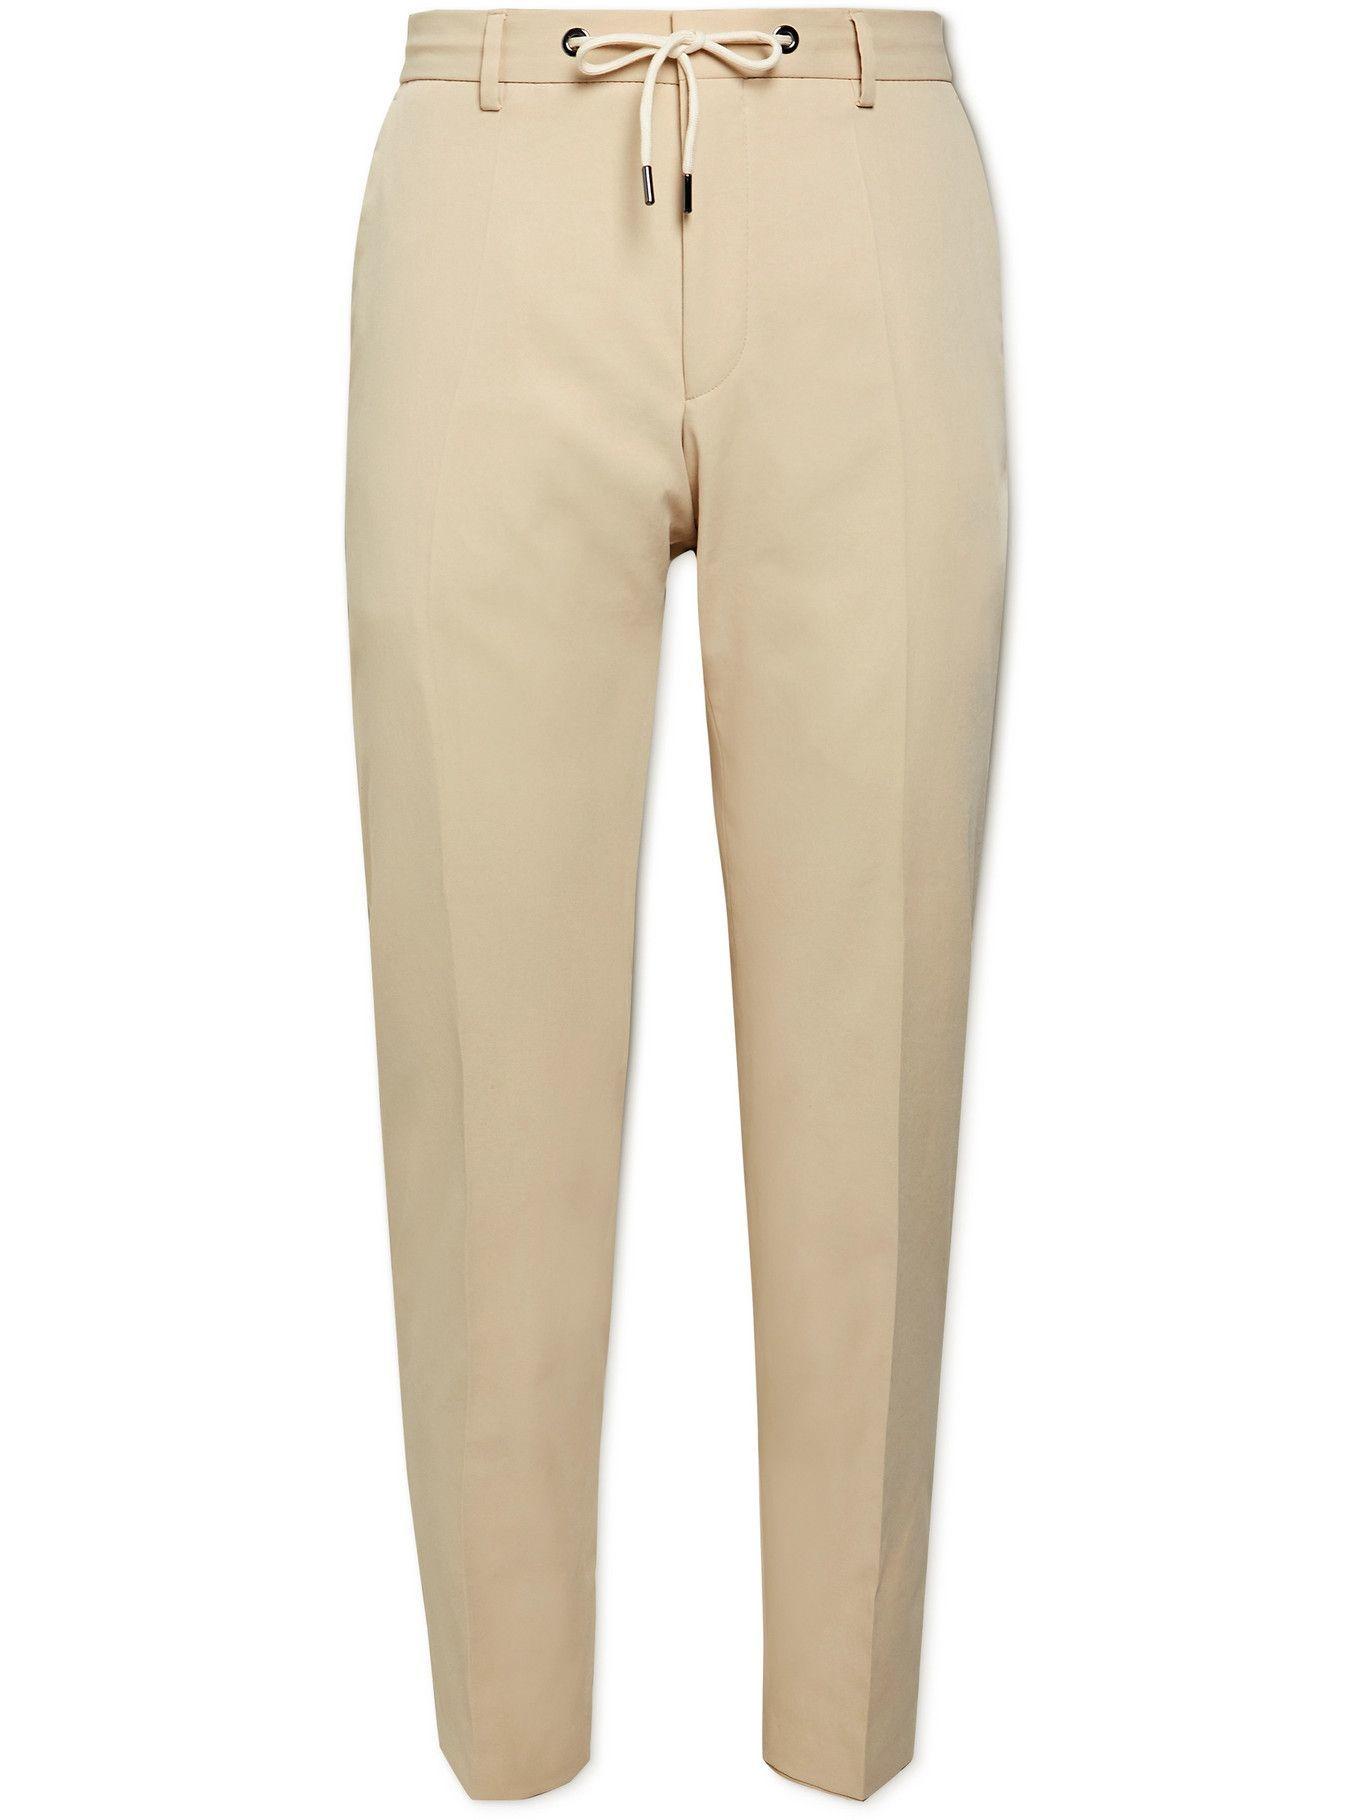 HUGO BOSS - Bardon Slim-Fit Twill Drawstring Suit Trousers - Neutrals